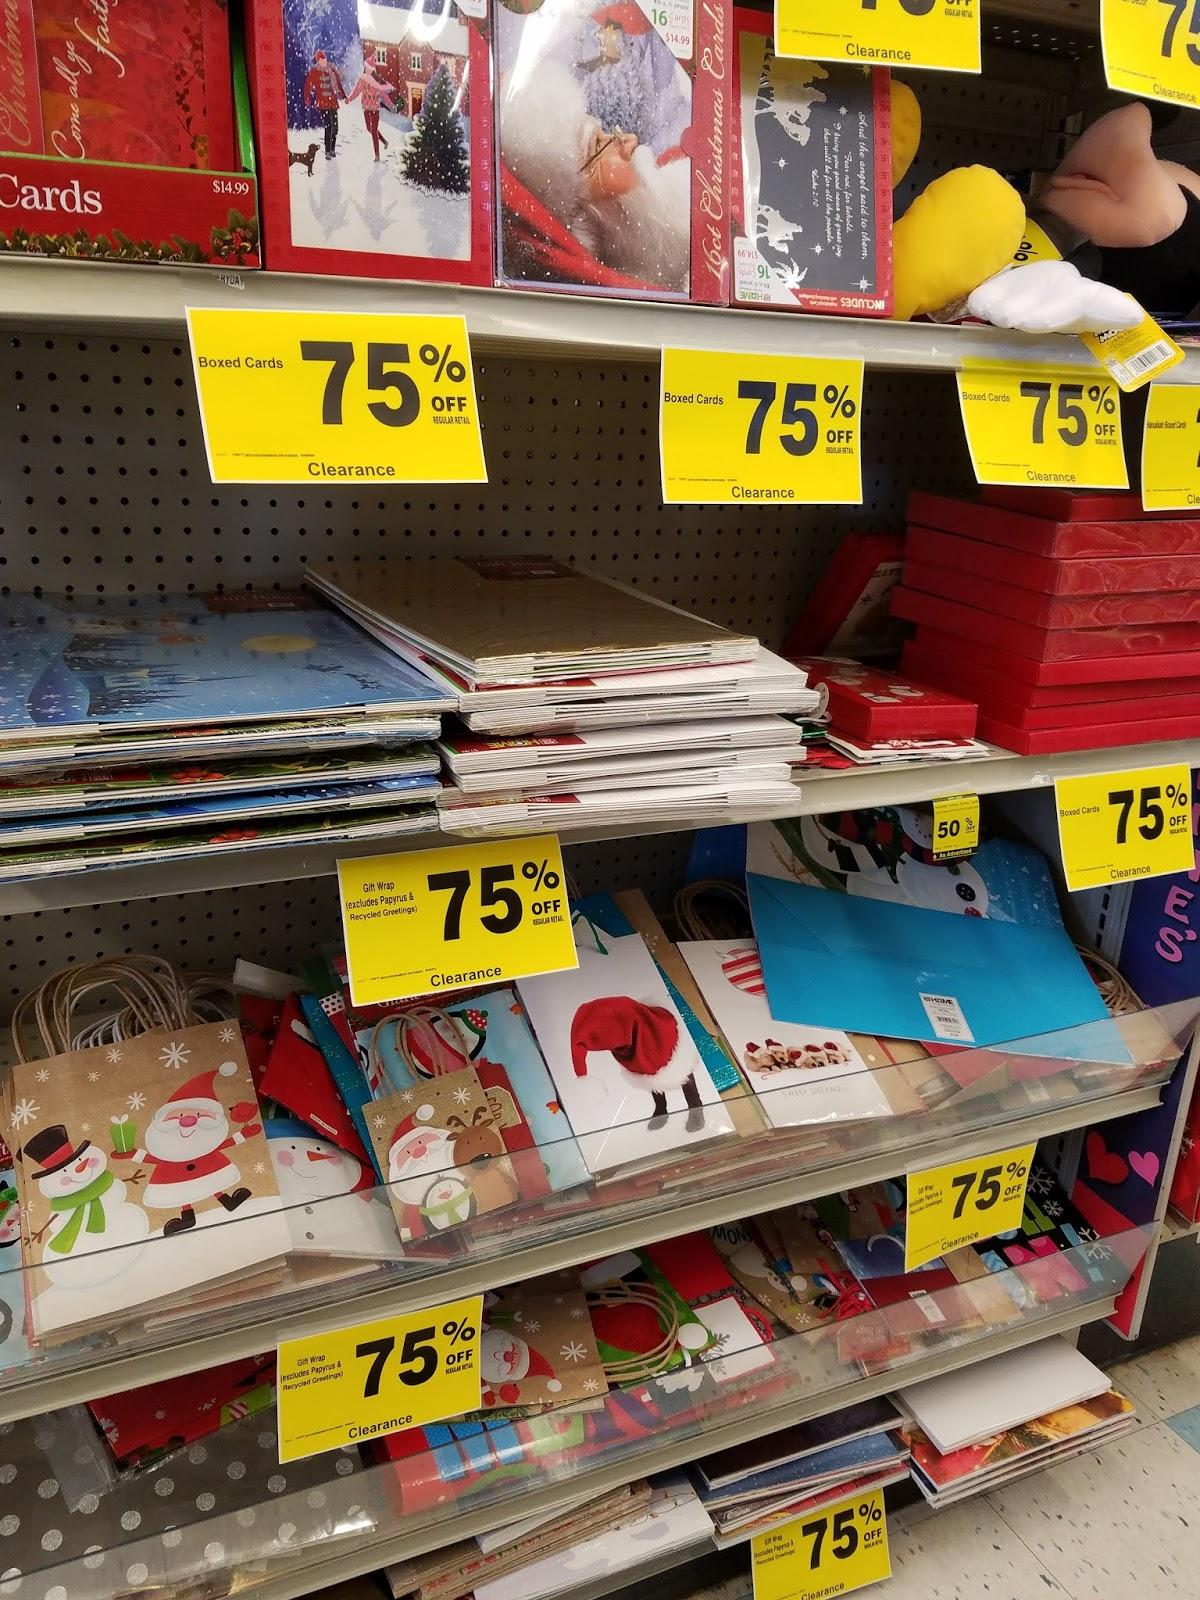 Donevas\' Shopping Cart: CHRISTMAS STILL 75% OFF AT RITE AID